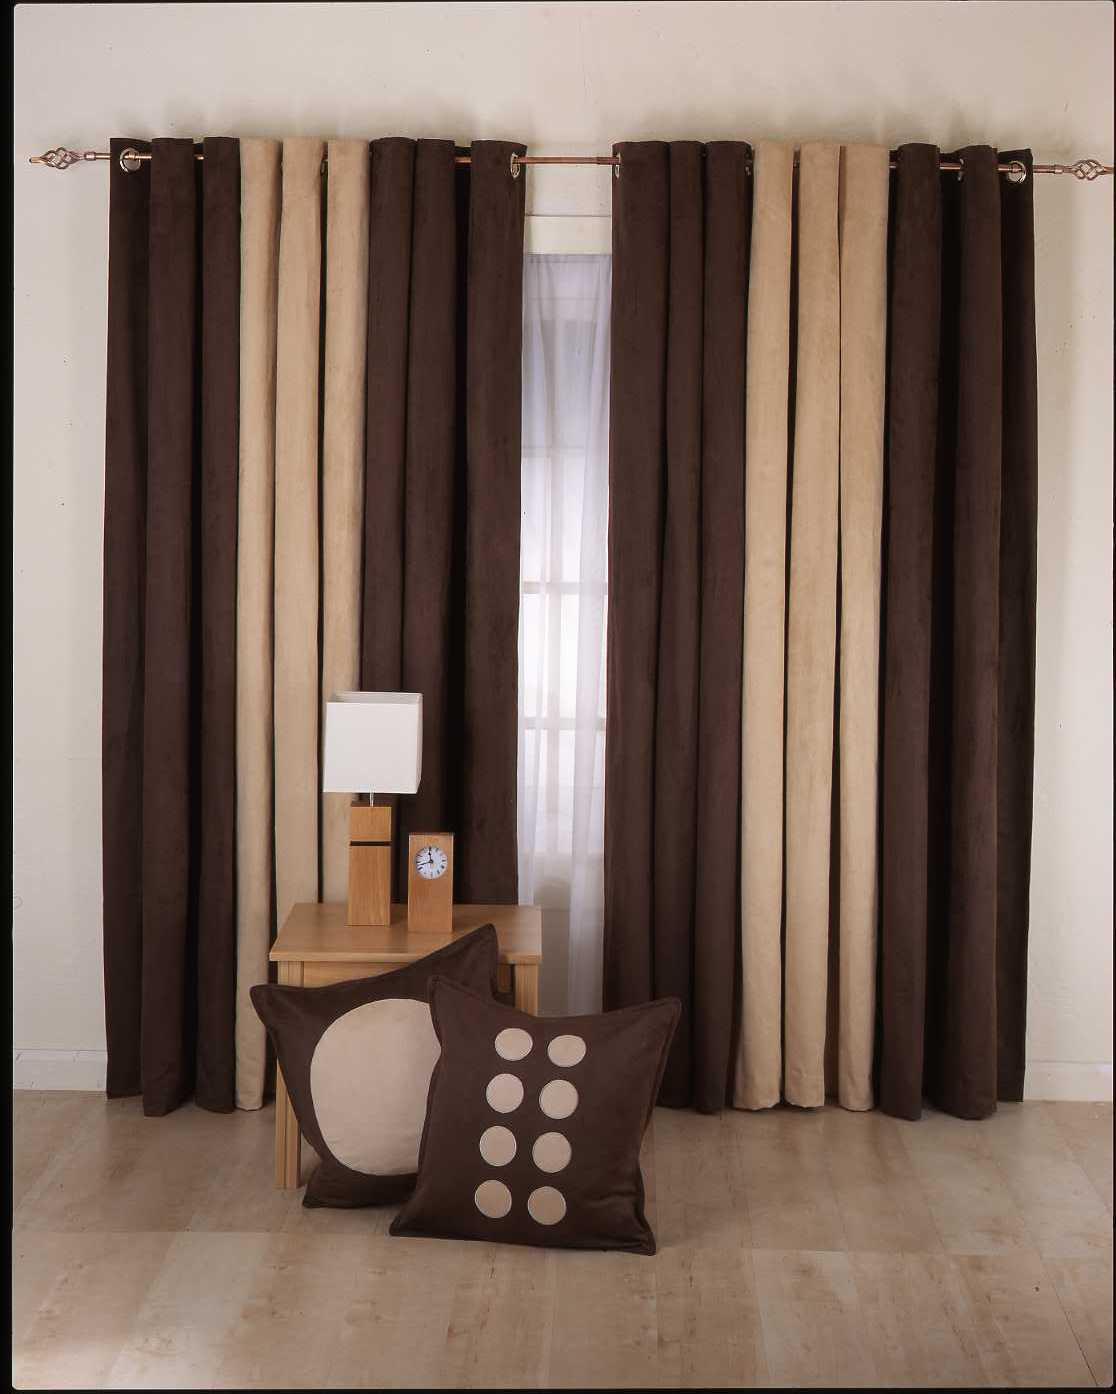 f0bdadfa4869a23d1a6b591370430938 20+ Hottest Curtain Design Ideas for 2021